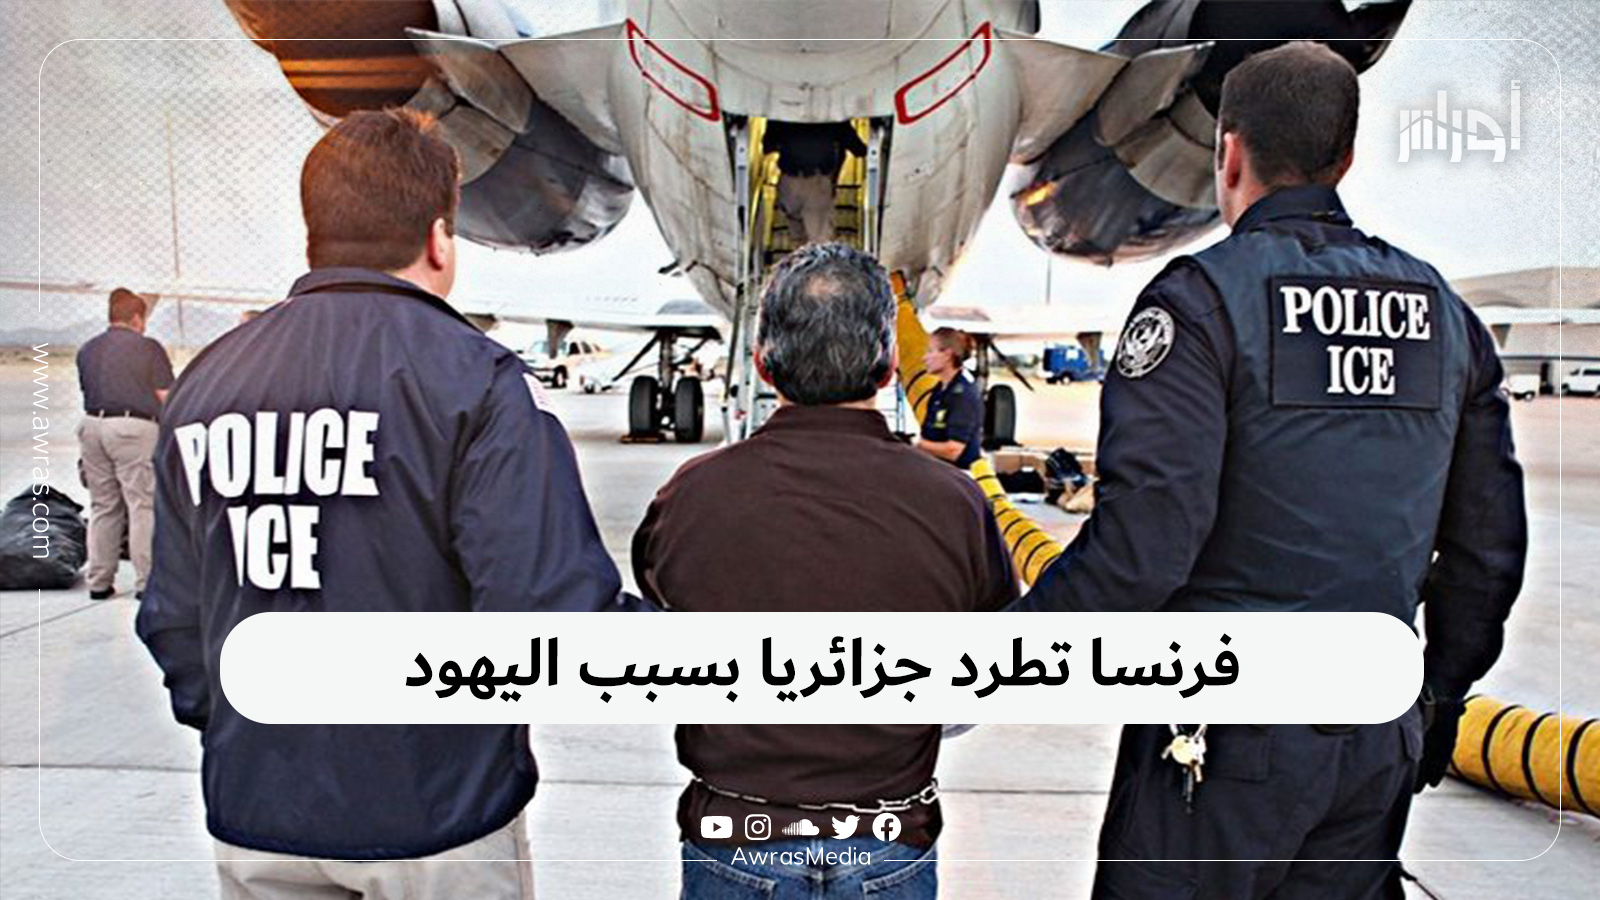 طرد جزائري من فرنسا بسبب اليهود